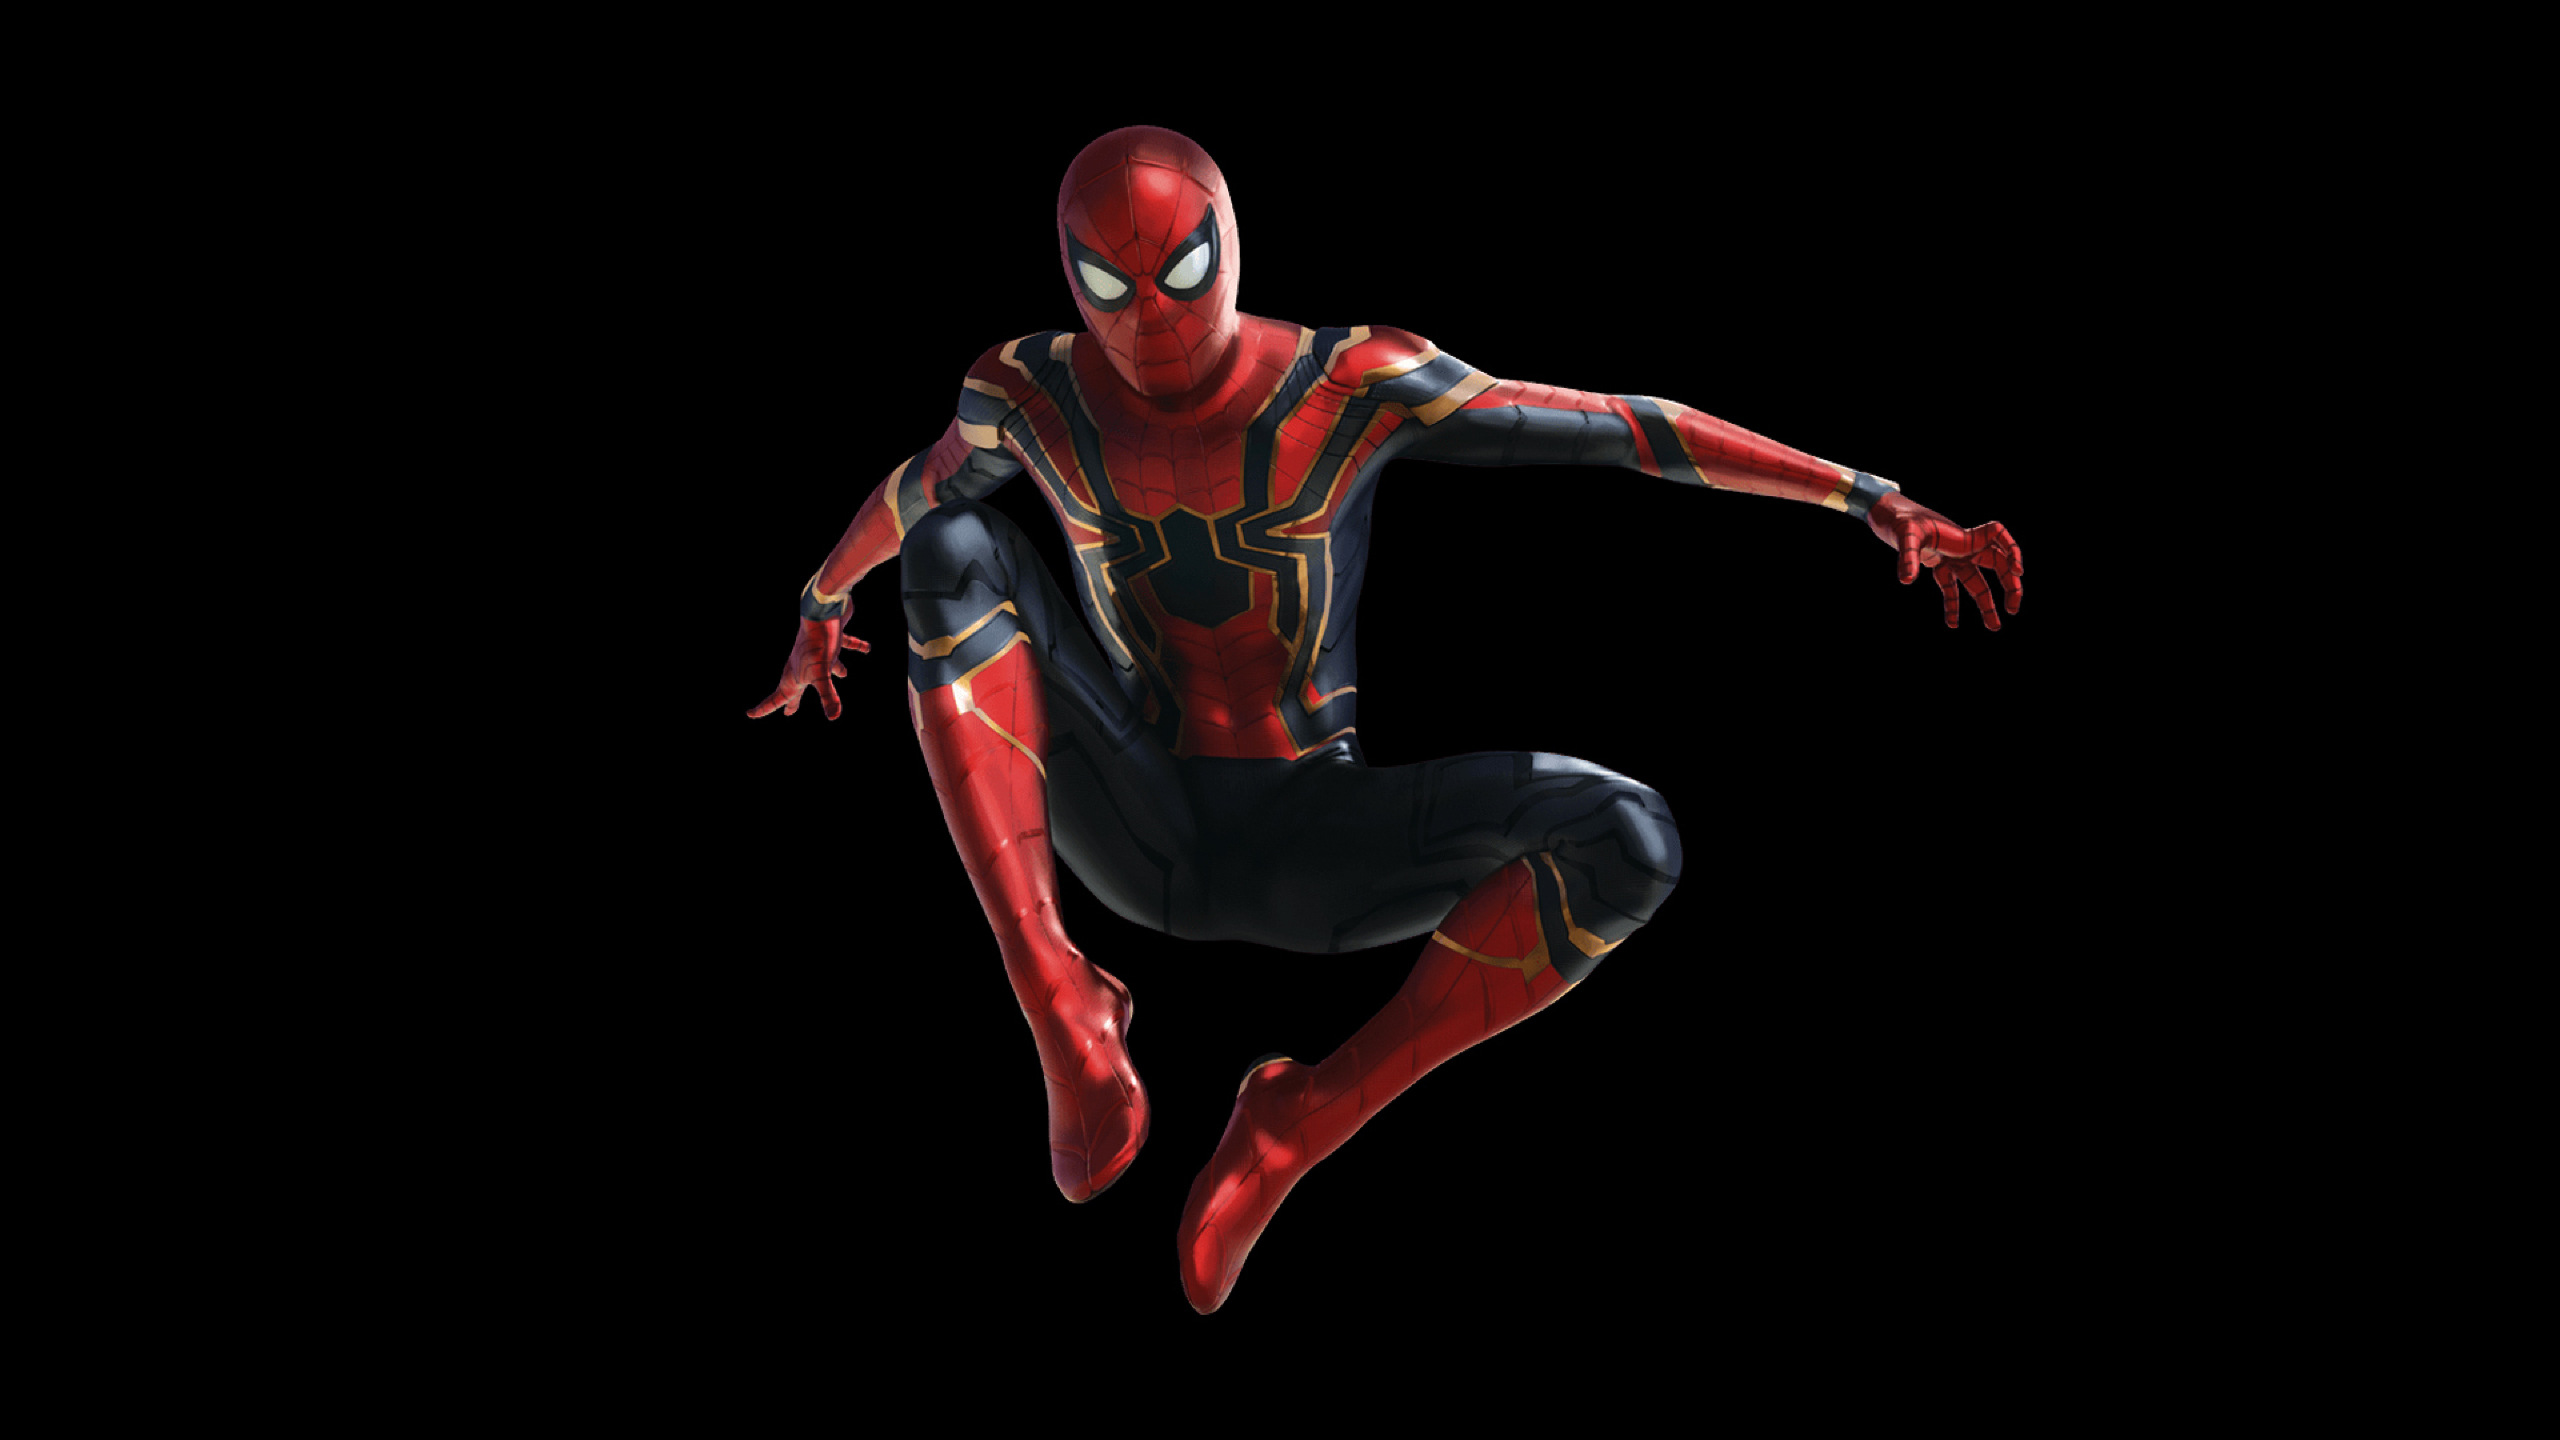 2560x1440 Spider Man In Avengers Infinity War 1440p